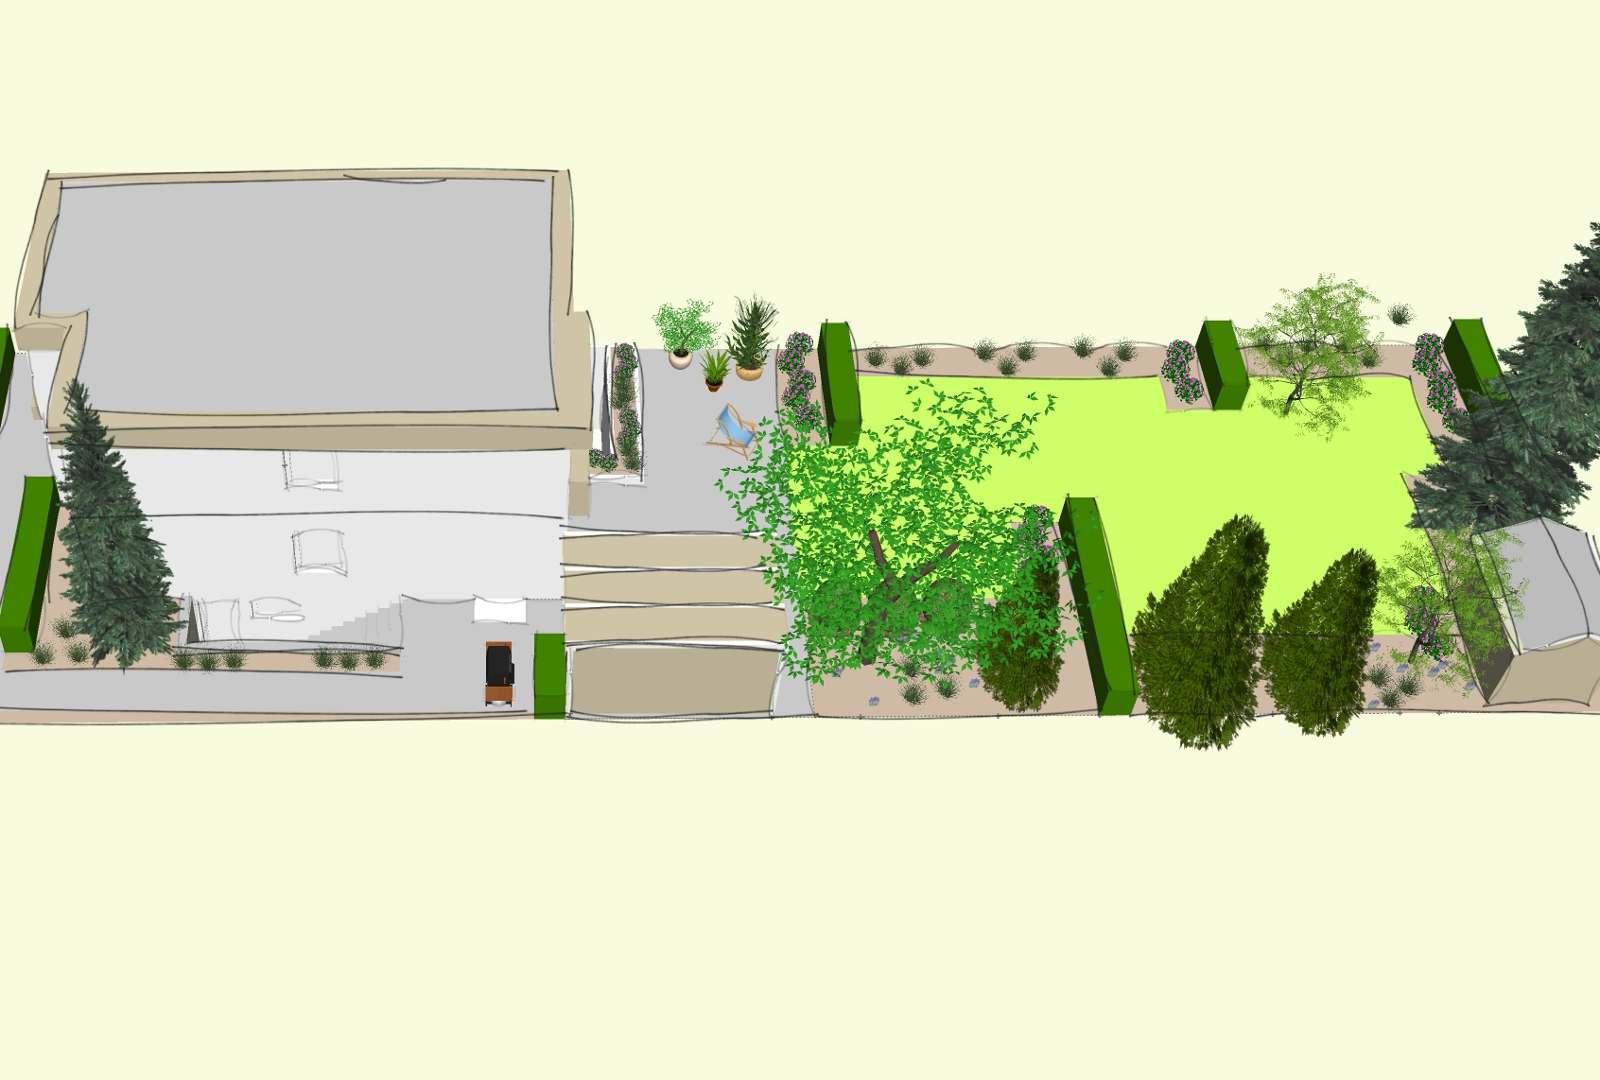 creaverdes planungsb ro architekten n rtingen. Black Bedroom Furniture Sets. Home Design Ideas